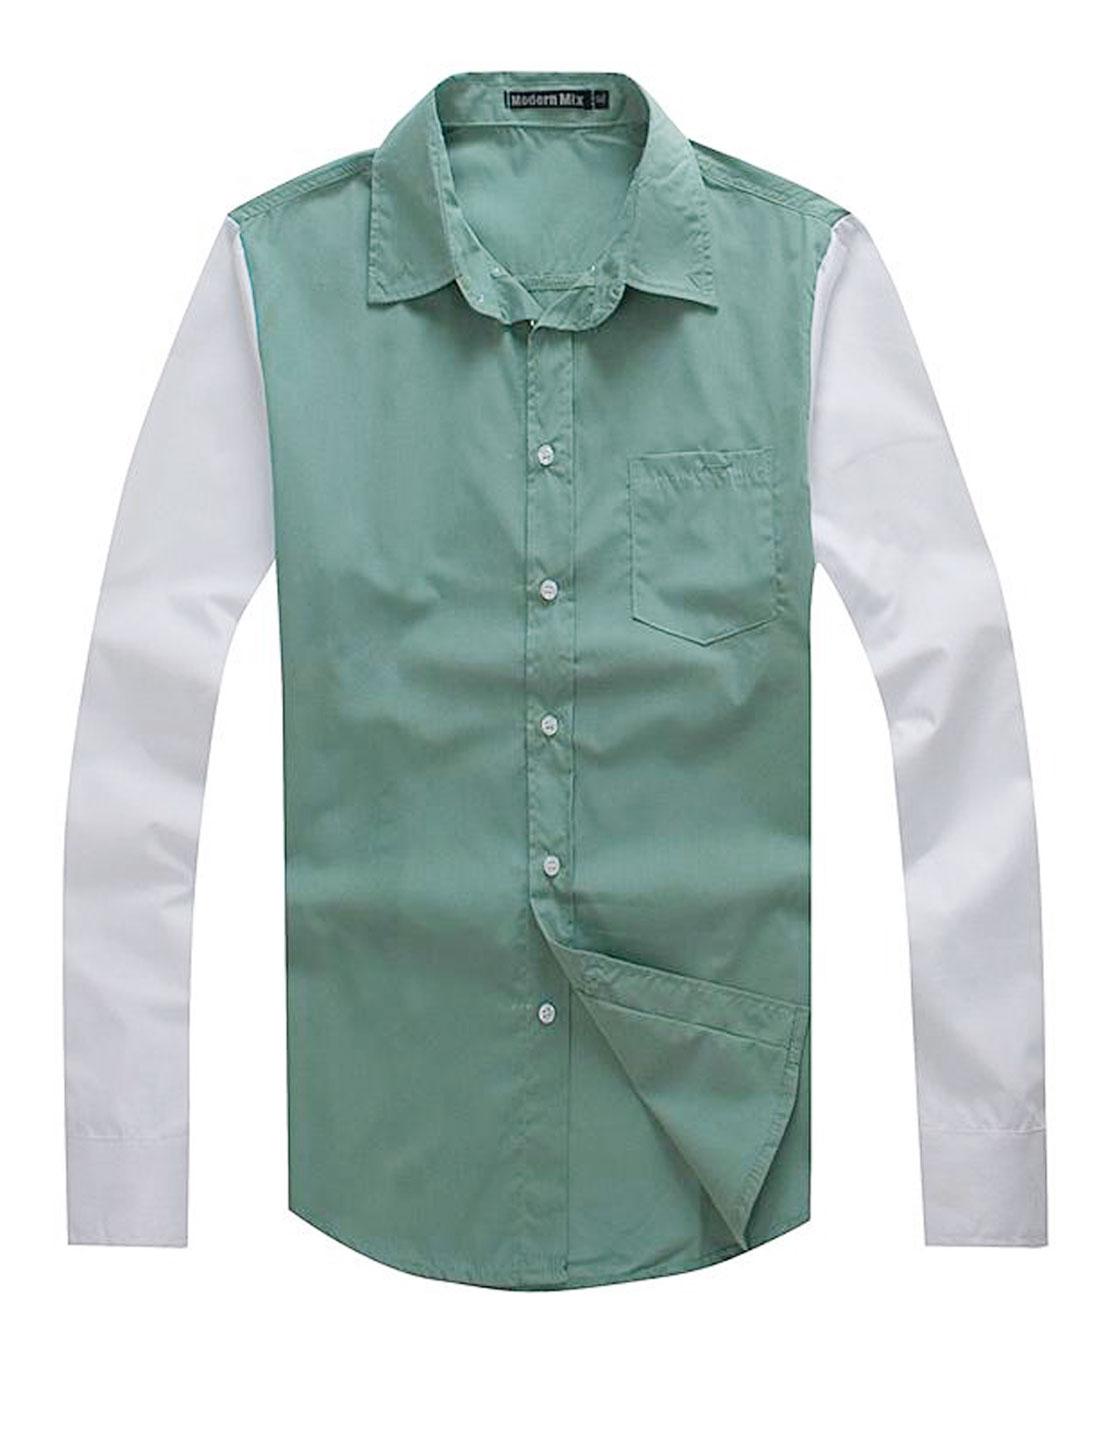 Men Casual Point Collar Contrast Color Long Sleeve Button Down Shirt Light Green M